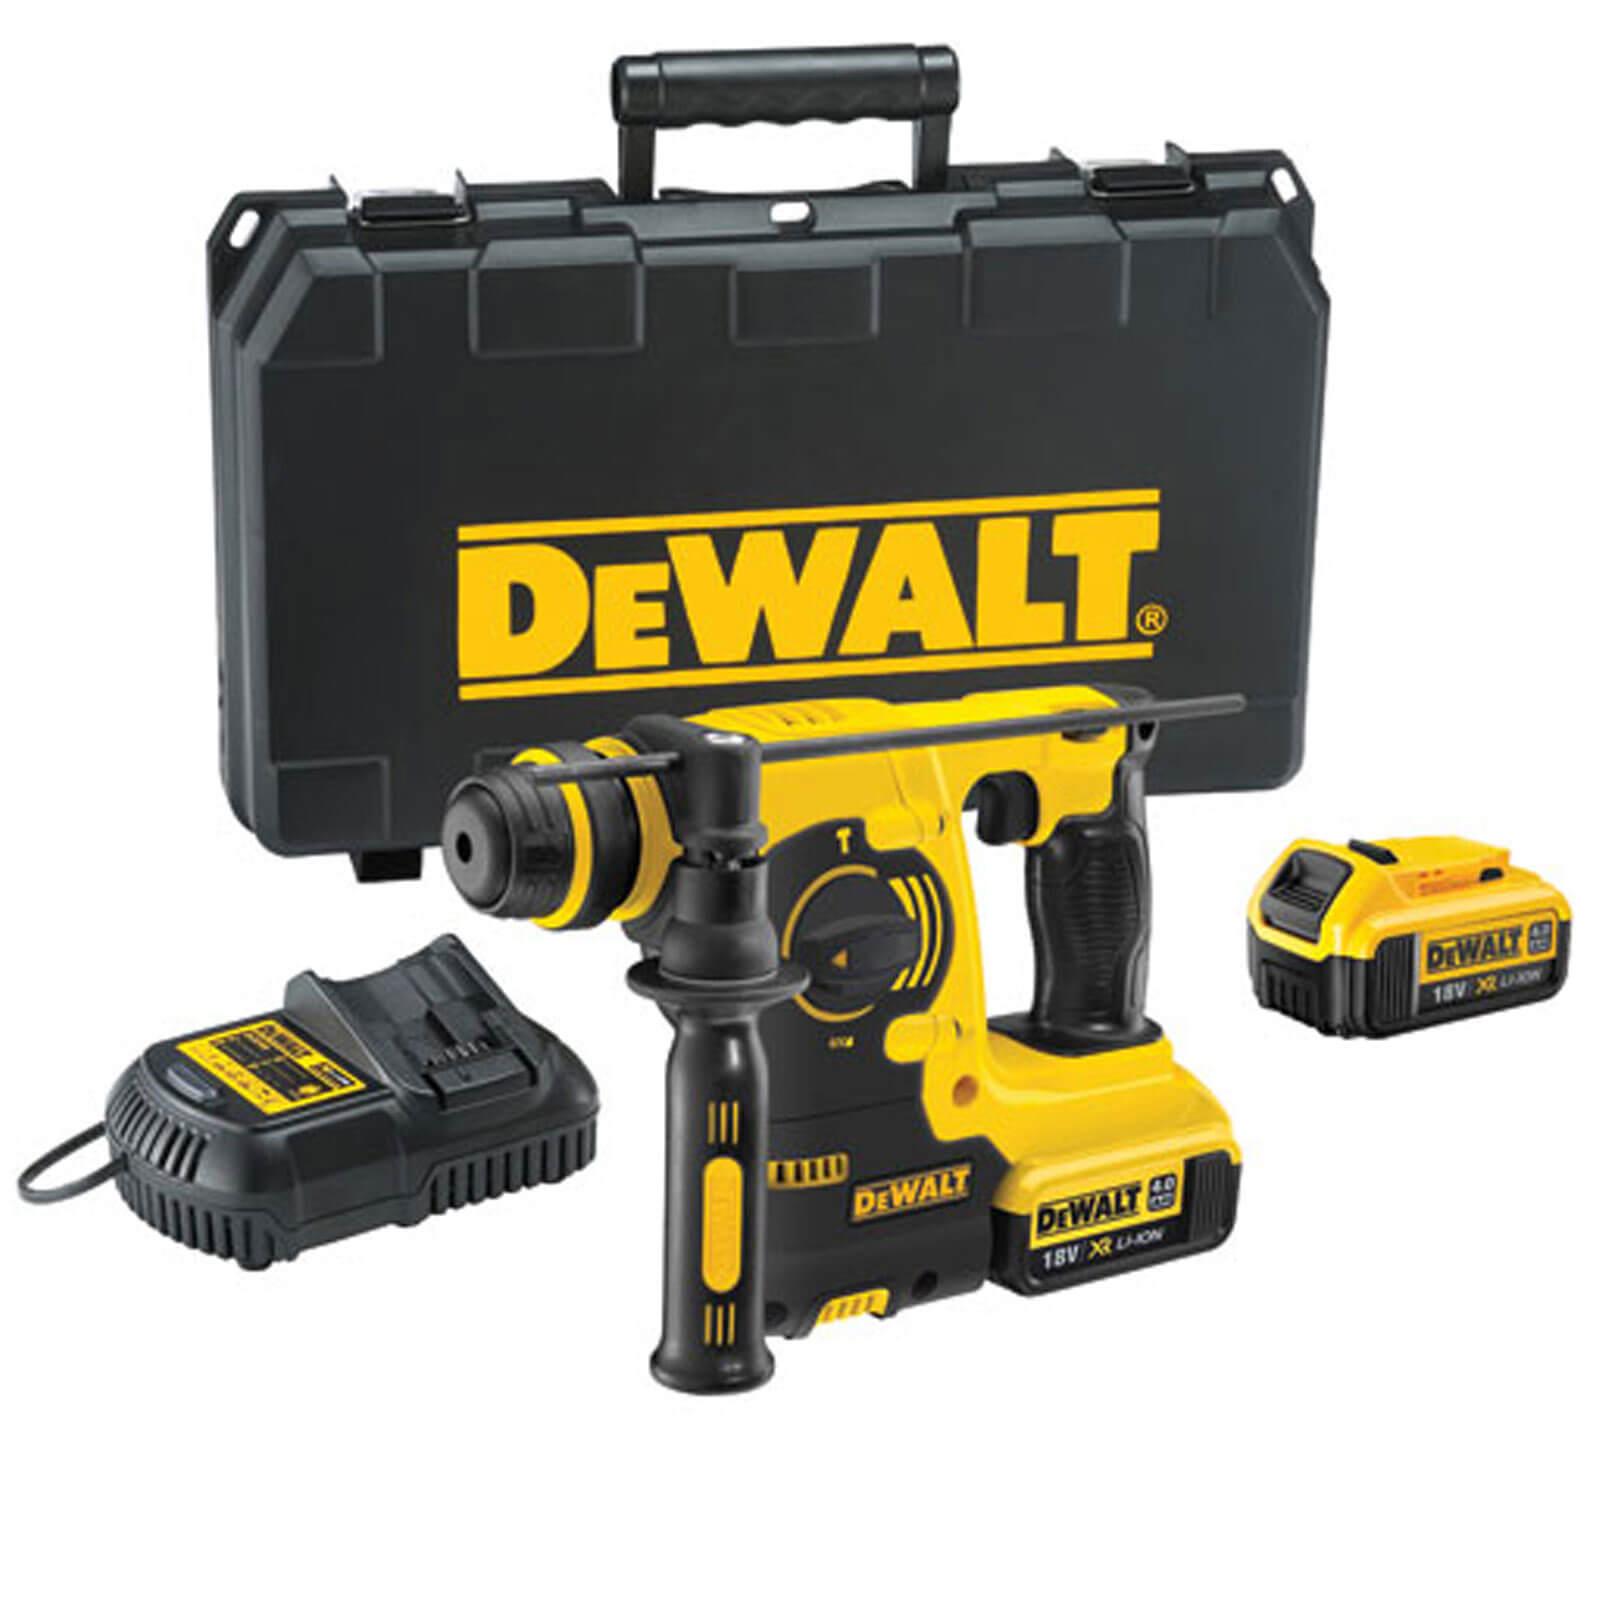 DeWalt DCH253M2 18v Cordless XR SDS Plus Rotary Hammer Drill with 2 Liion Batteries 4ah